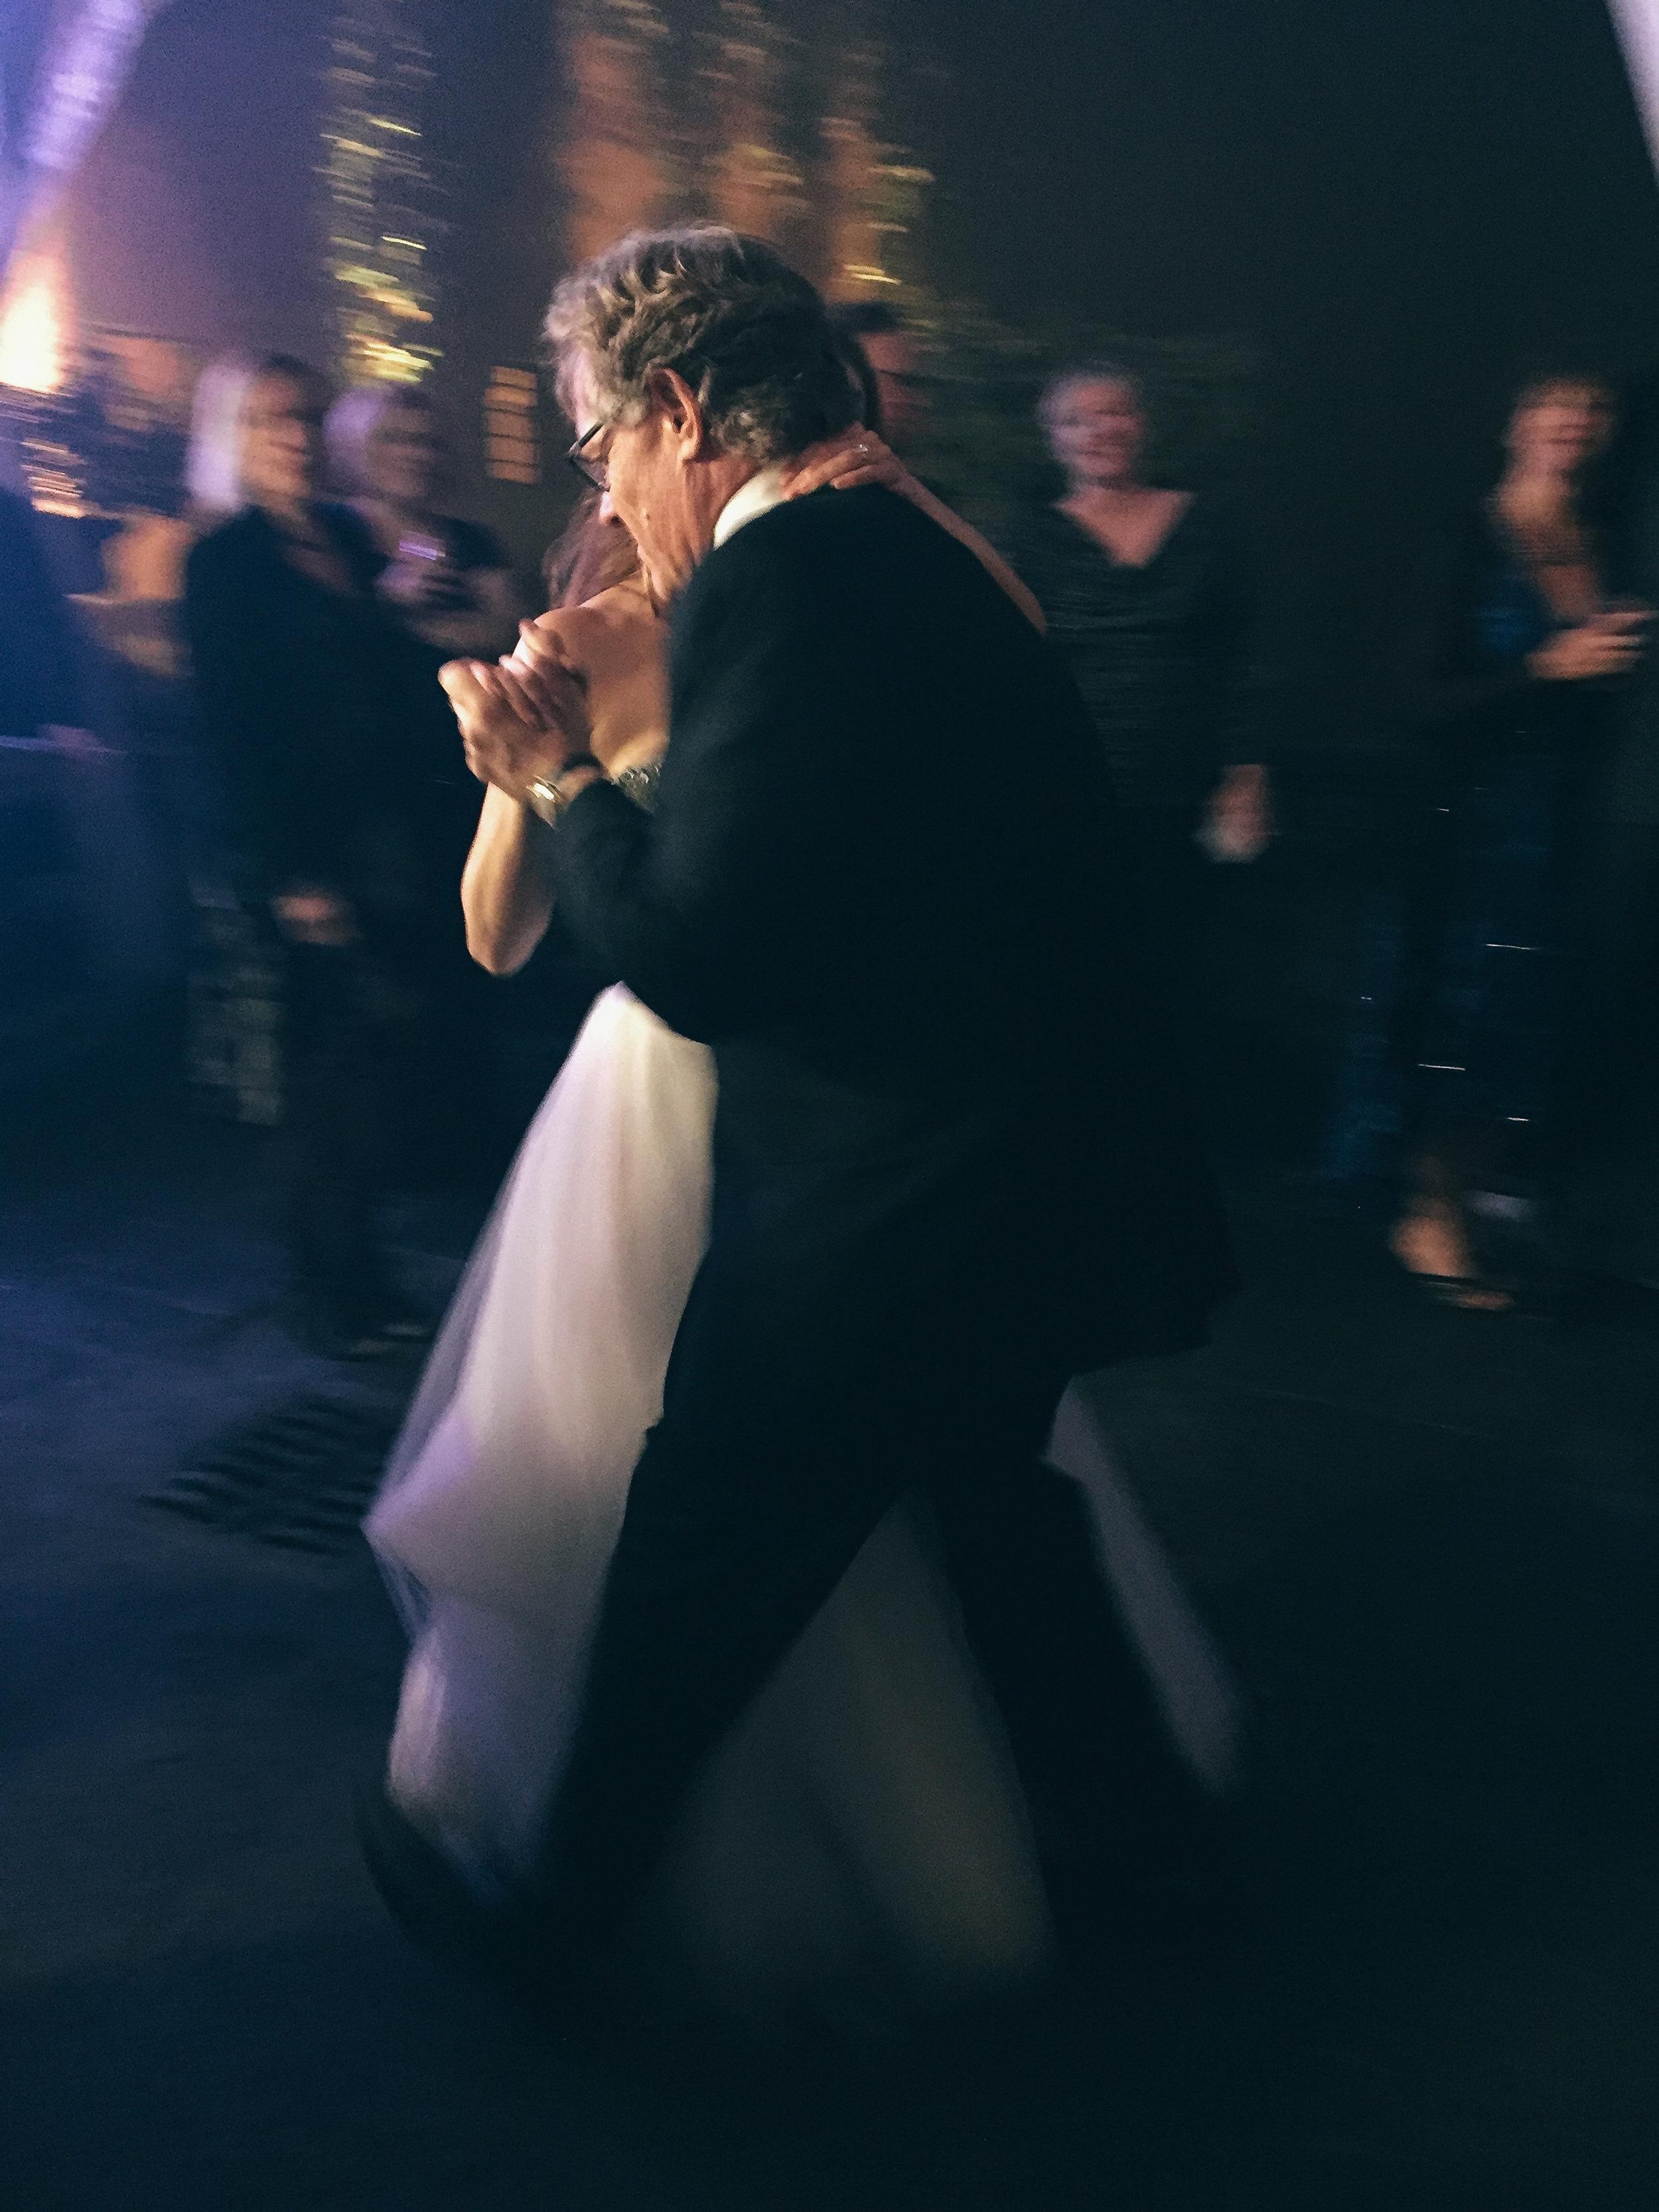 il-borro-toscana-wedding-tuscany-lifeonpine_Photo Oct 08, 10 23 43 PM.jpg